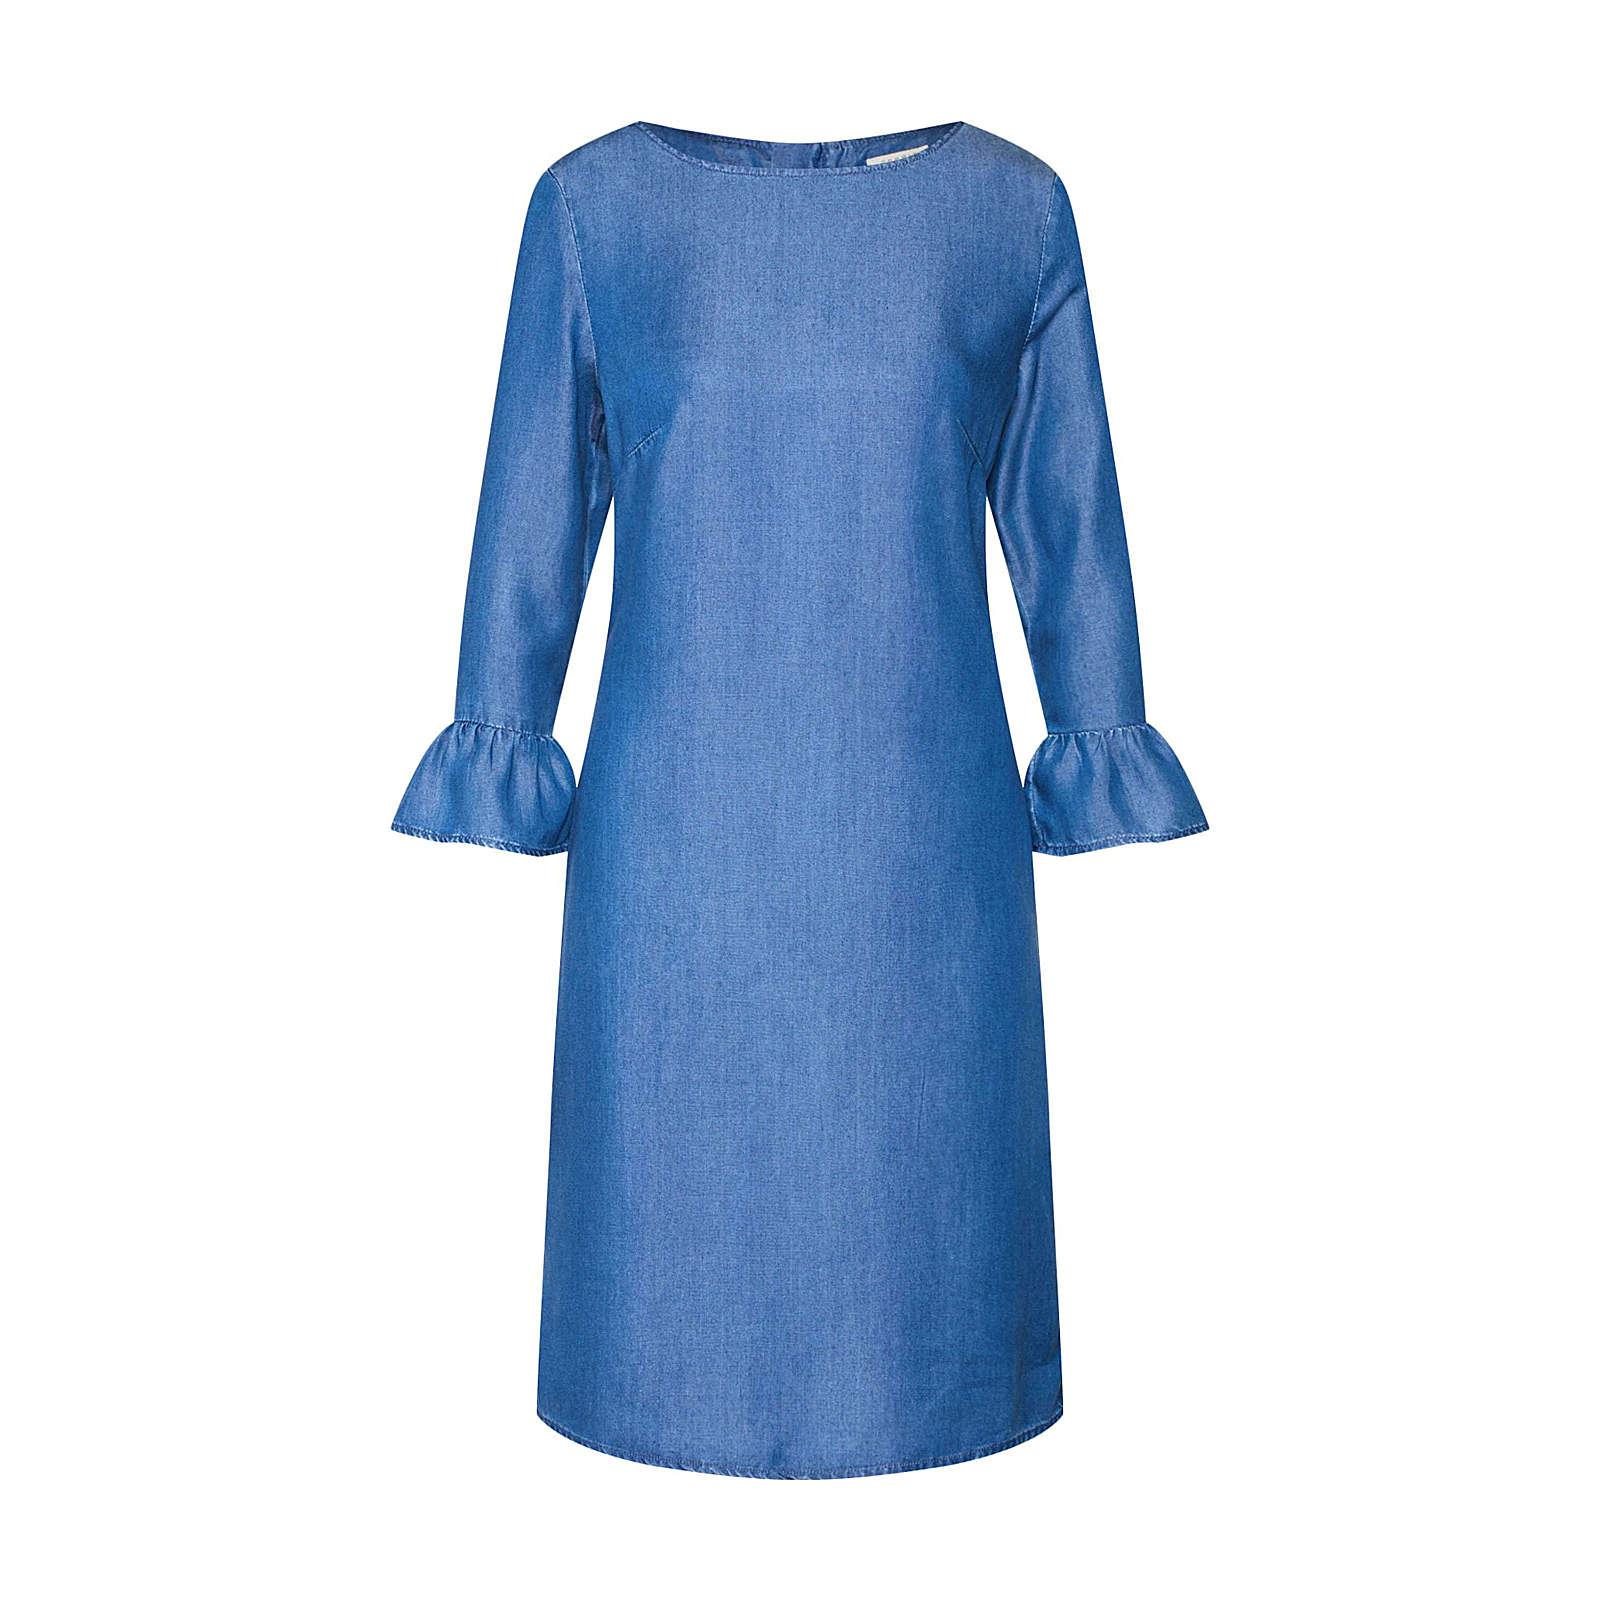 ESPRIT Kleid Jeanskleider blue denim Damen Gr. 38